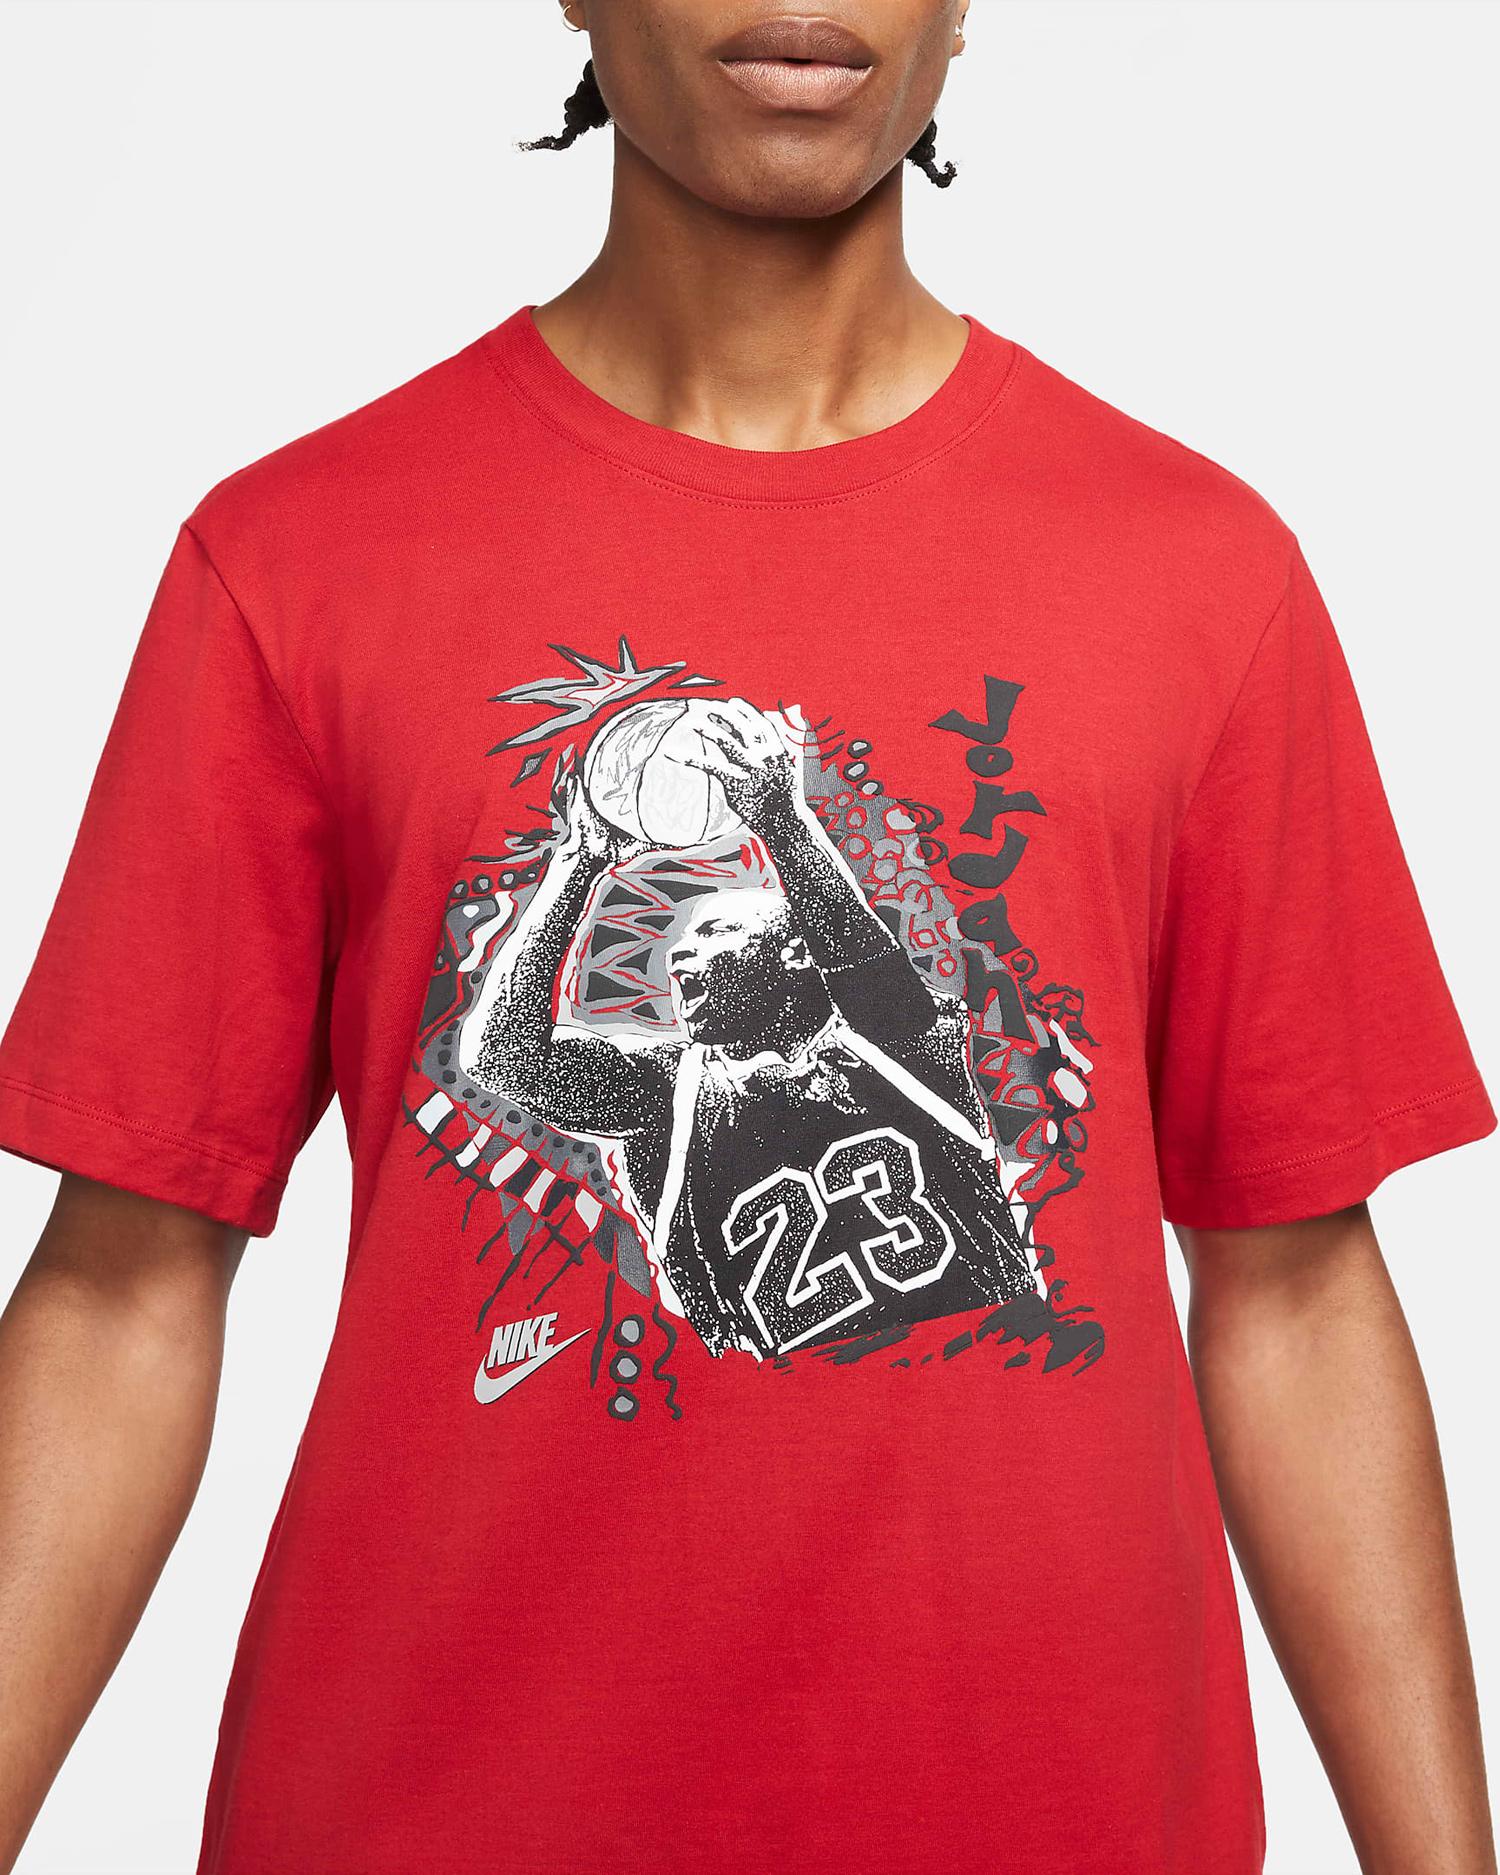 jordan-gym-red-vintage-t-shirt